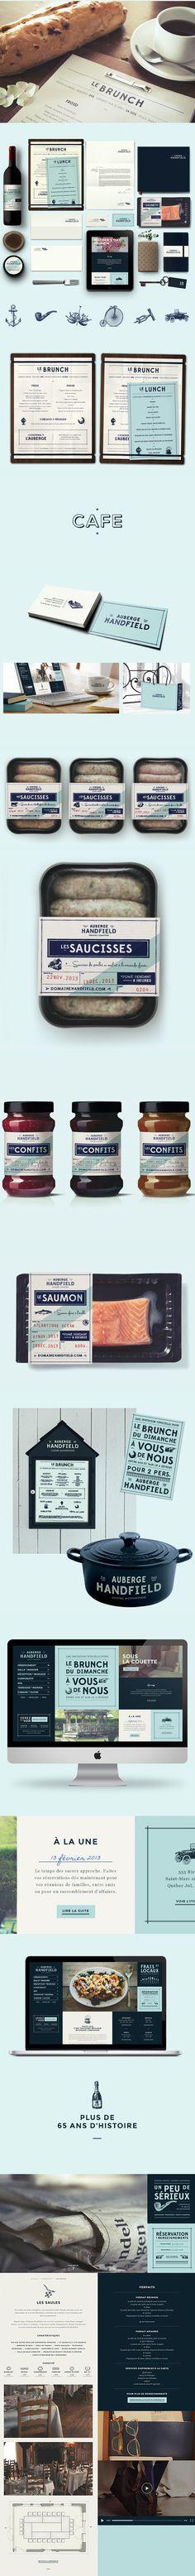 Auberge Handfield branding and packaging | #stationary #corporate #design #corporatedesign #identity #branding #marketing